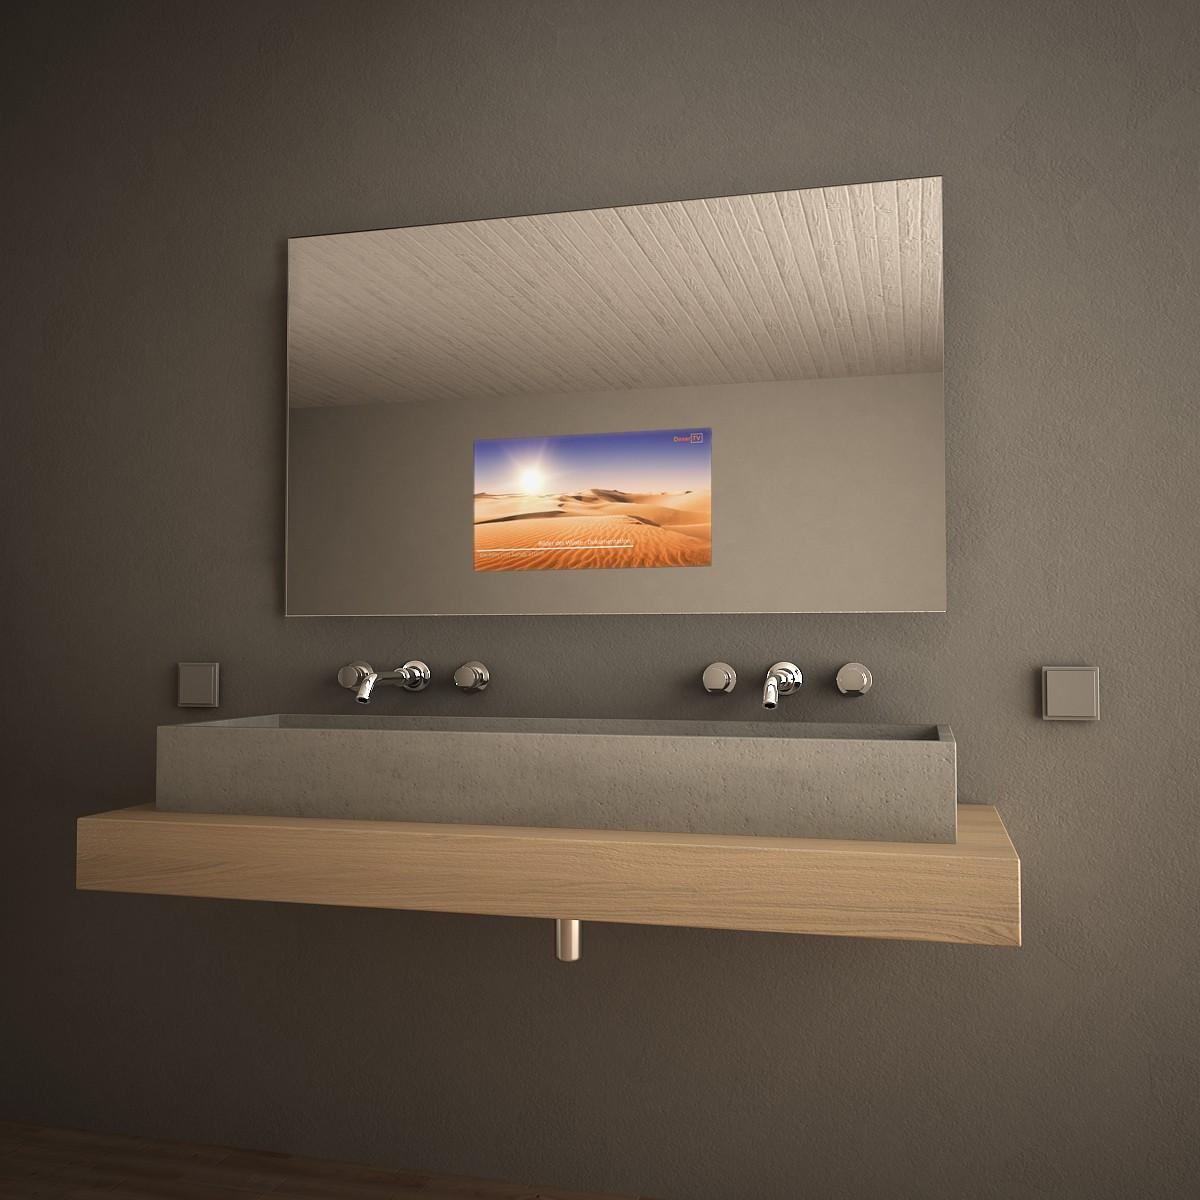 tv spiegel ohne beleuchtung firraun ohne beleuchtung 9000354. Black Bedroom Furniture Sets. Home Design Ideas